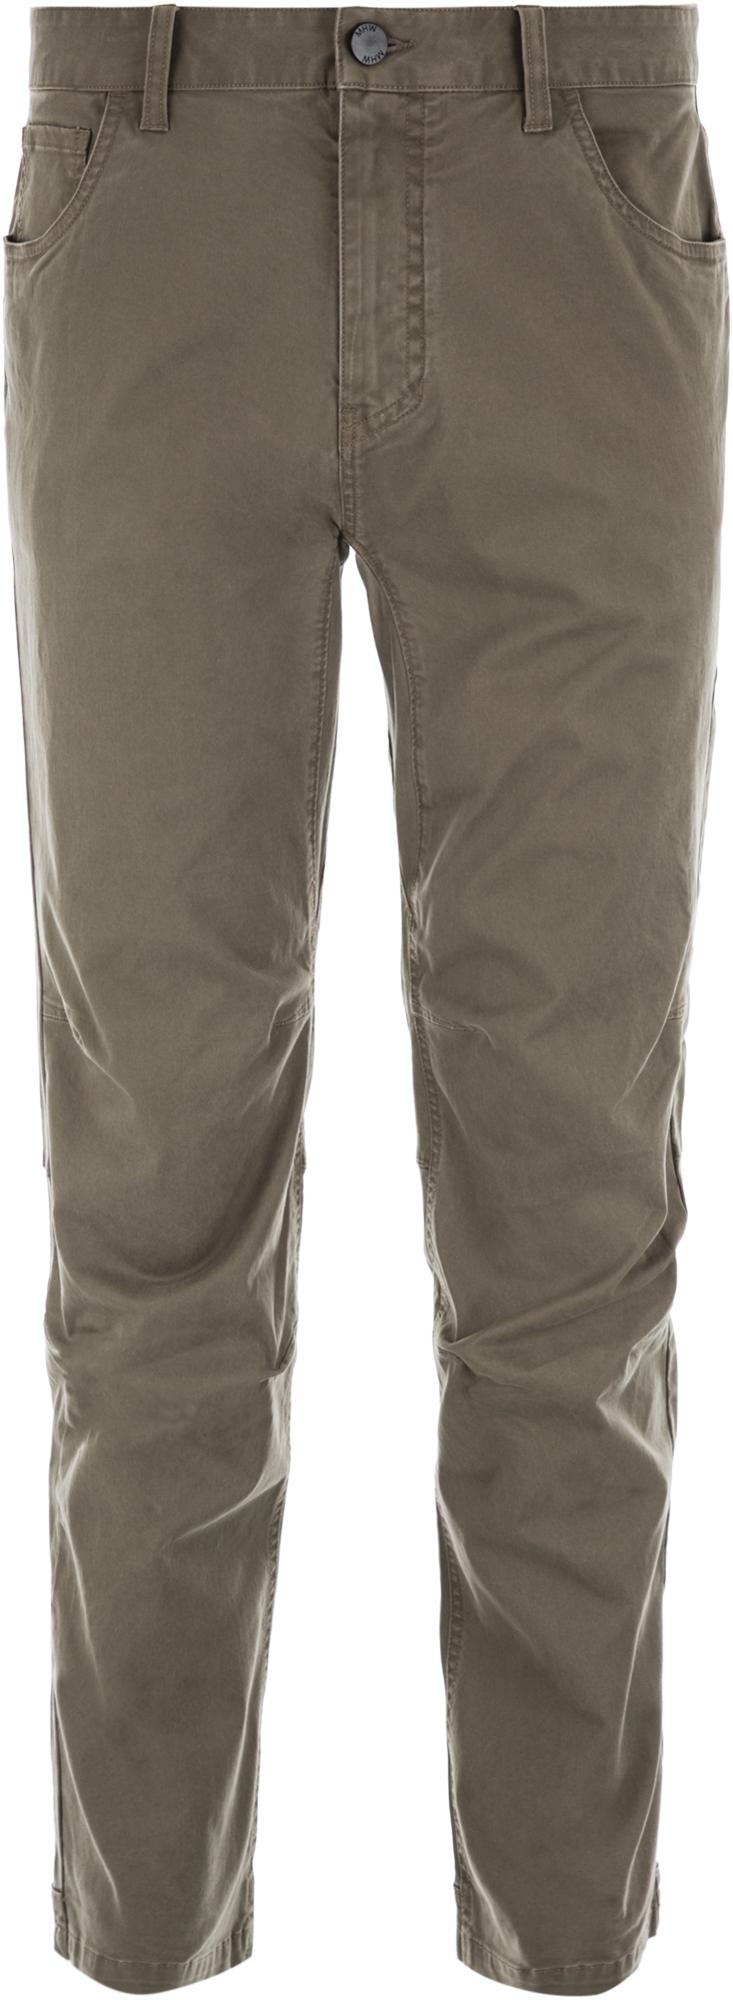 Mountain Hardwear Брюки мужские Mountain Hardwear Cederberg, размер 56 цена